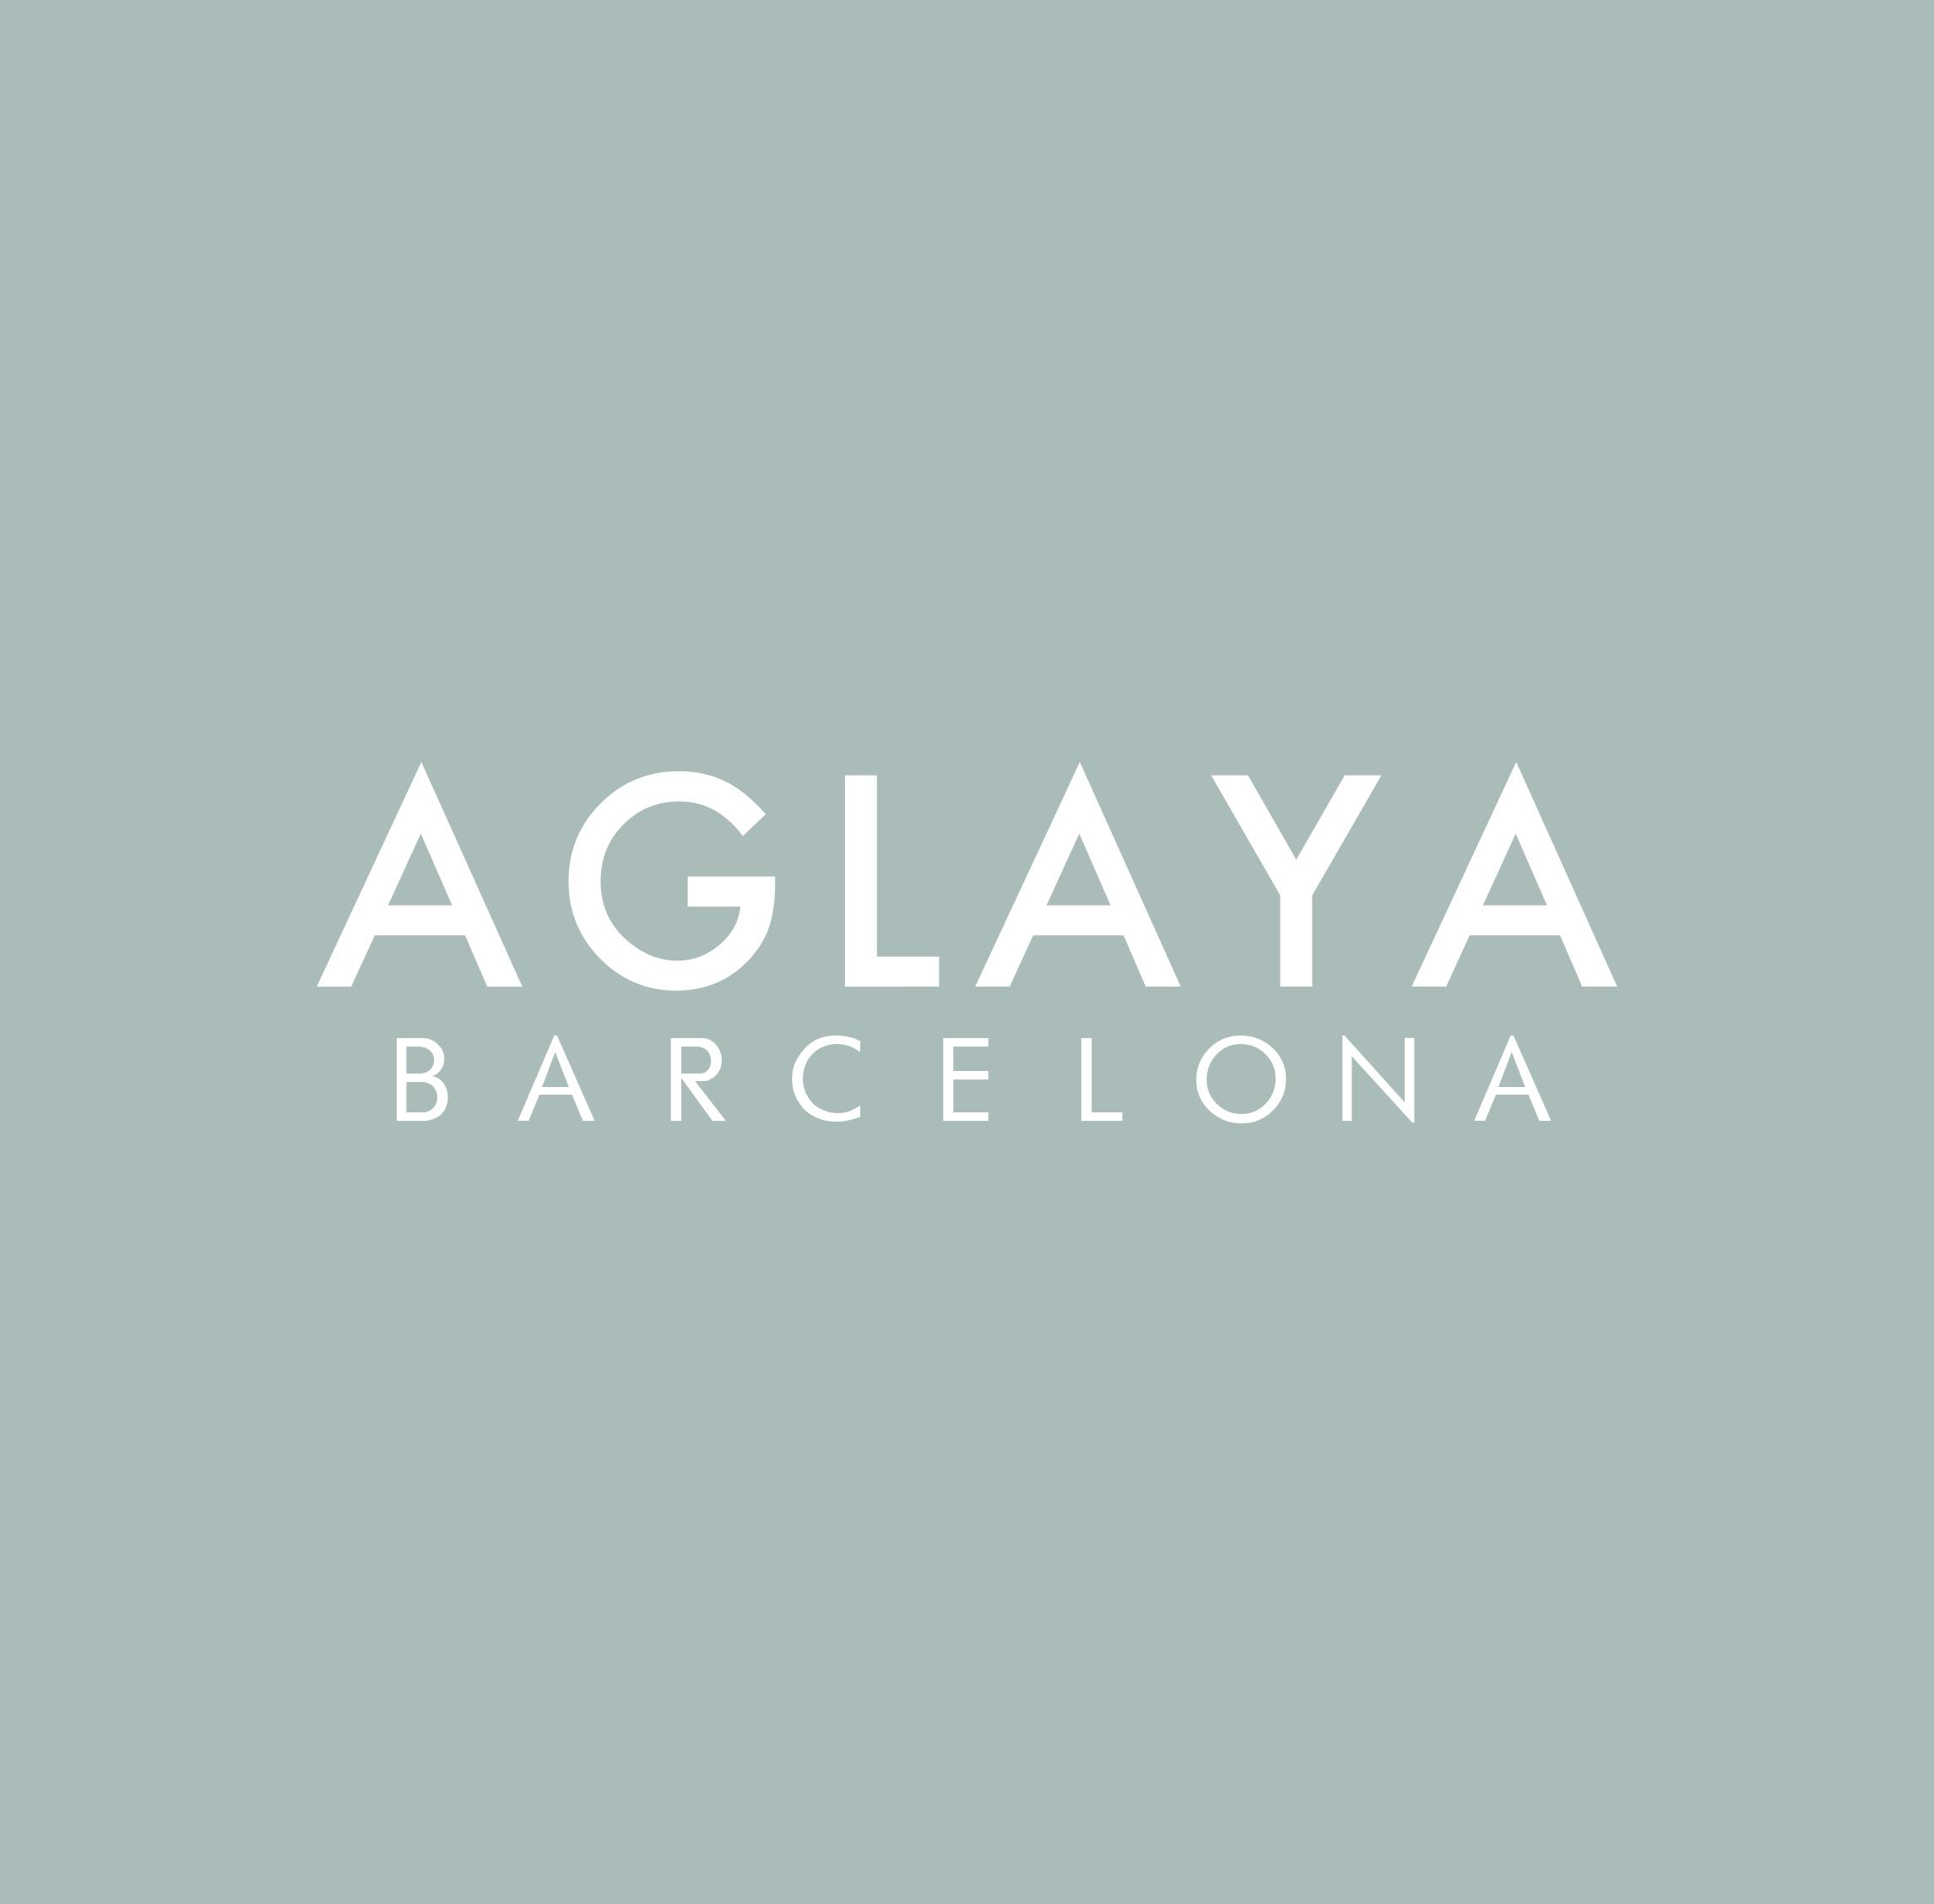 Aglaya Barcelona